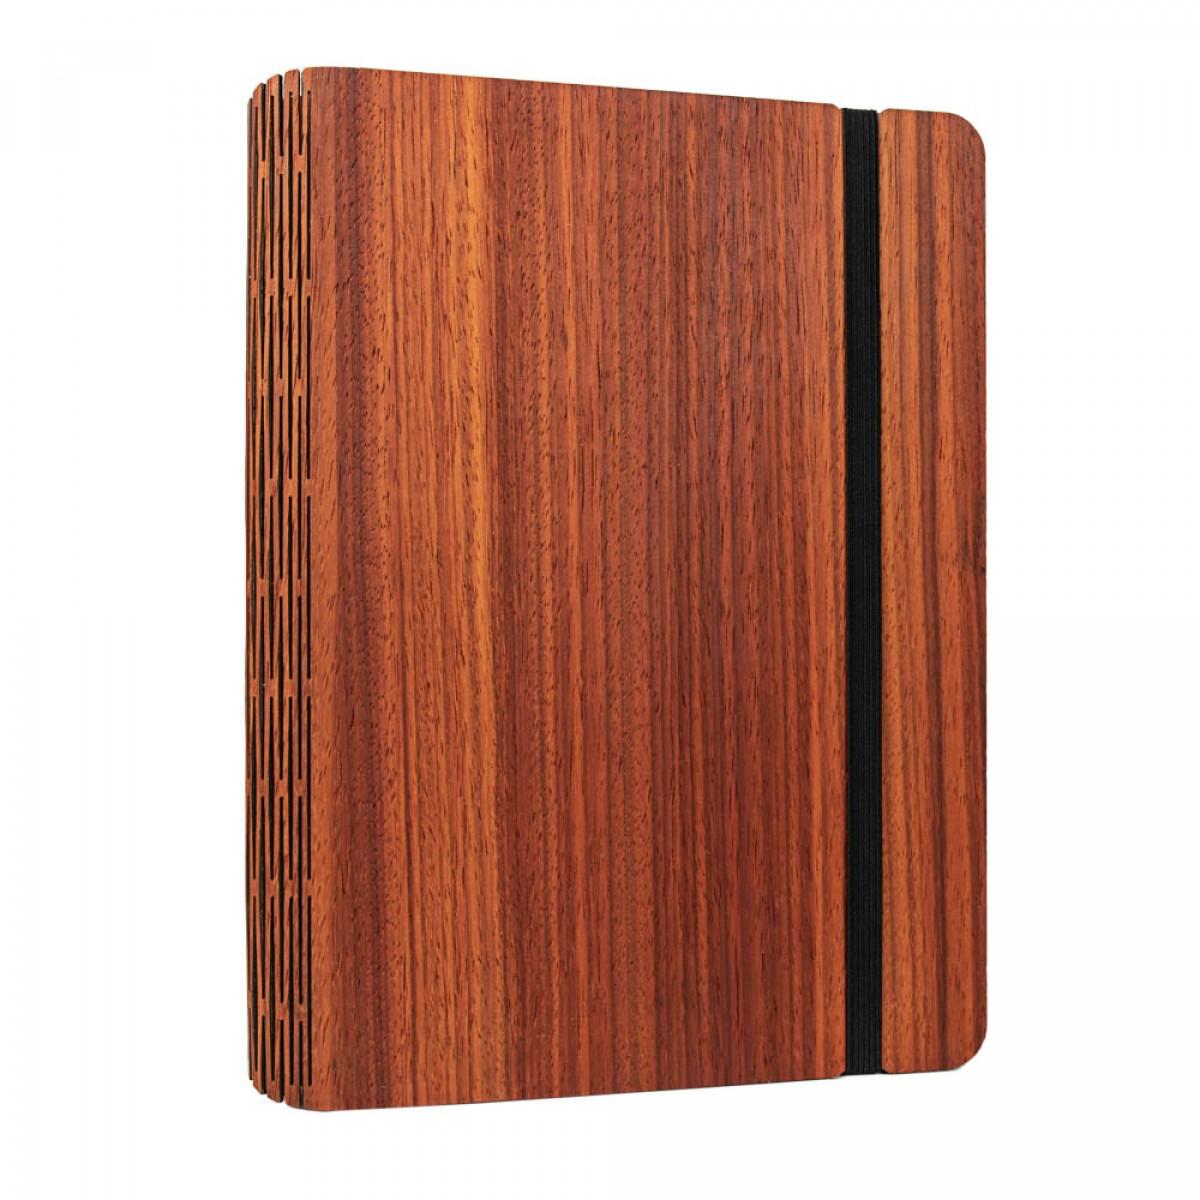 JUNGHOLZ Design WoodCase, Tablet, Padouk, iPad Pro 10.5''